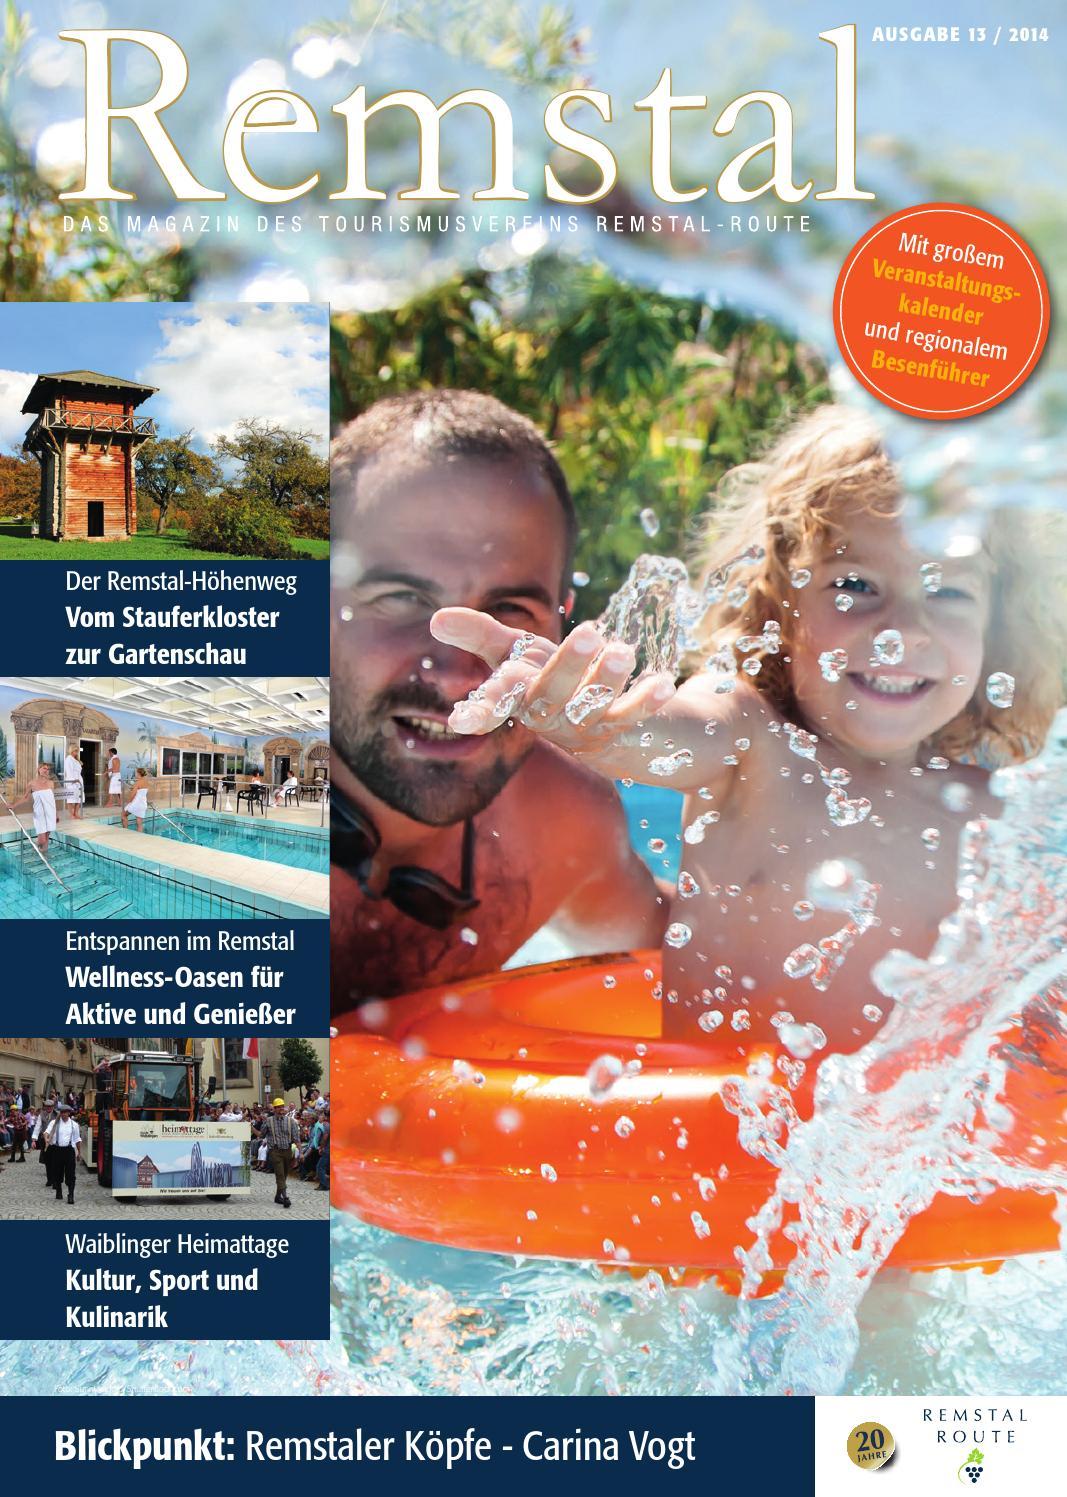 Remstal Magazin Ausgabe 13 By Tourismusverein Remstal Route E V Issuu